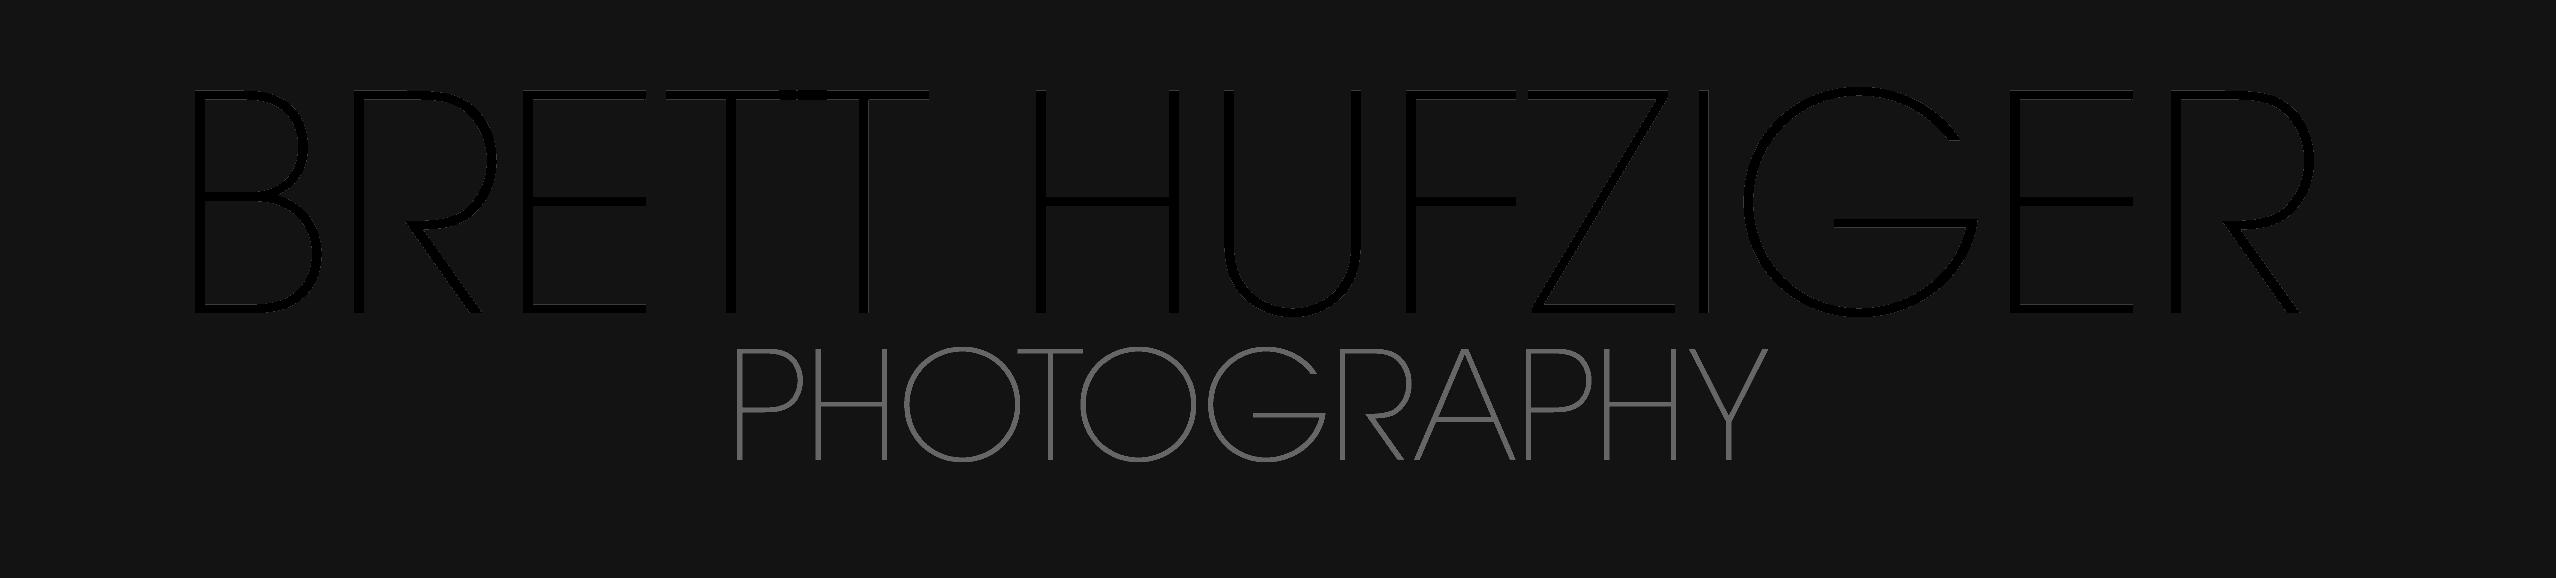 Brett Hufziger Photography Logo